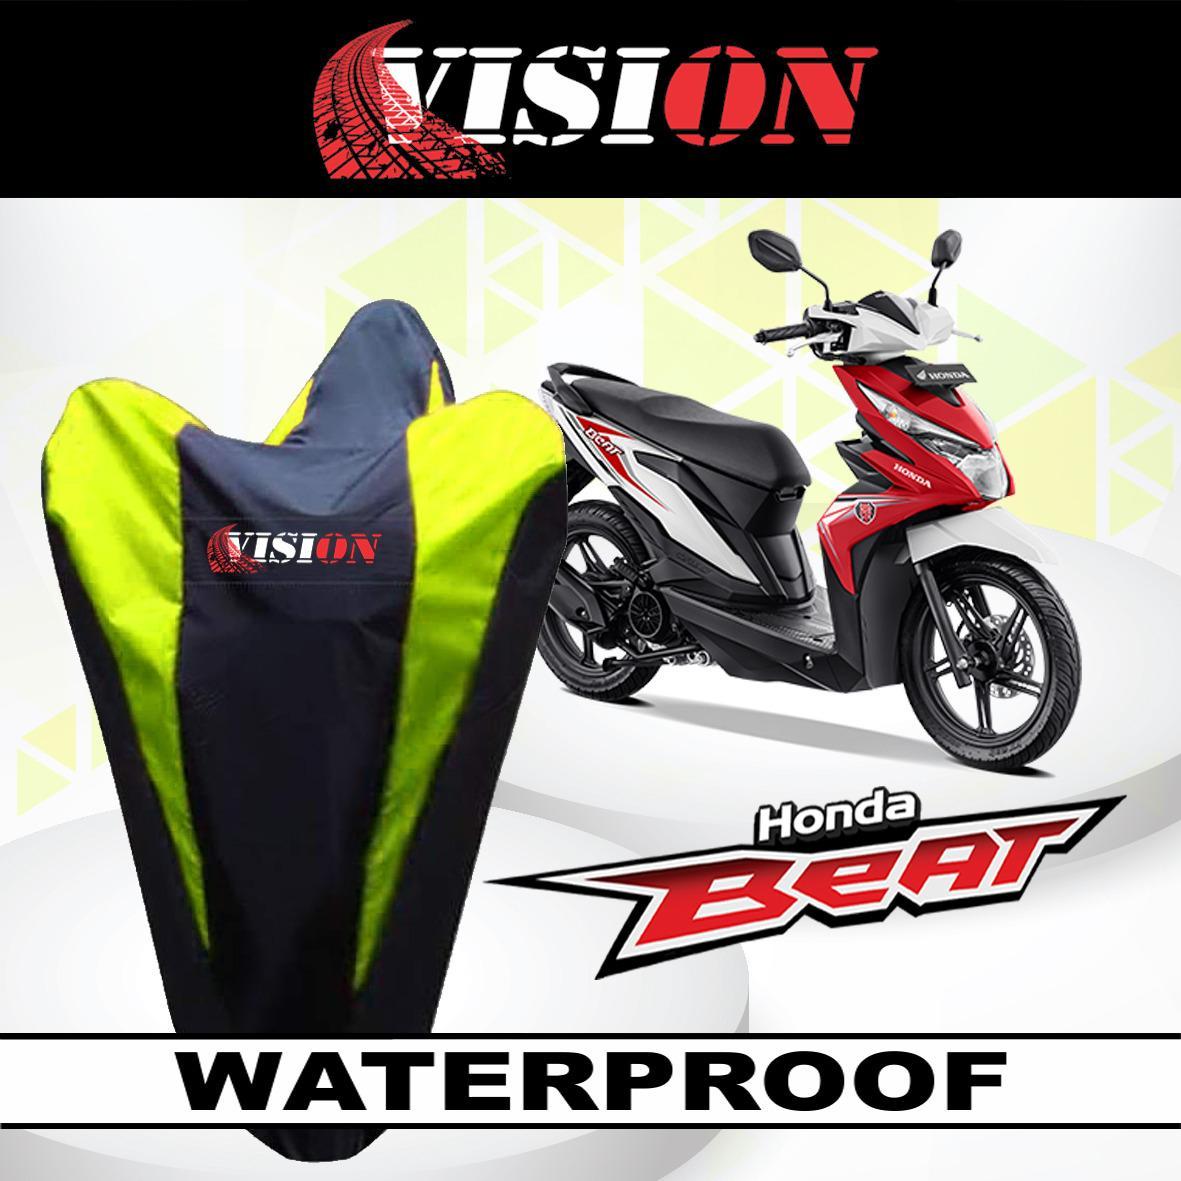 [ BAYAR DI TEMPAT ] List KUNING VISION Sarung Bodi Motor Honda Beat Anti Air Cover Body Waterproof Penutup Pelindung Selimut Penjaga LEXI NMAX AEROX VARIO PCX